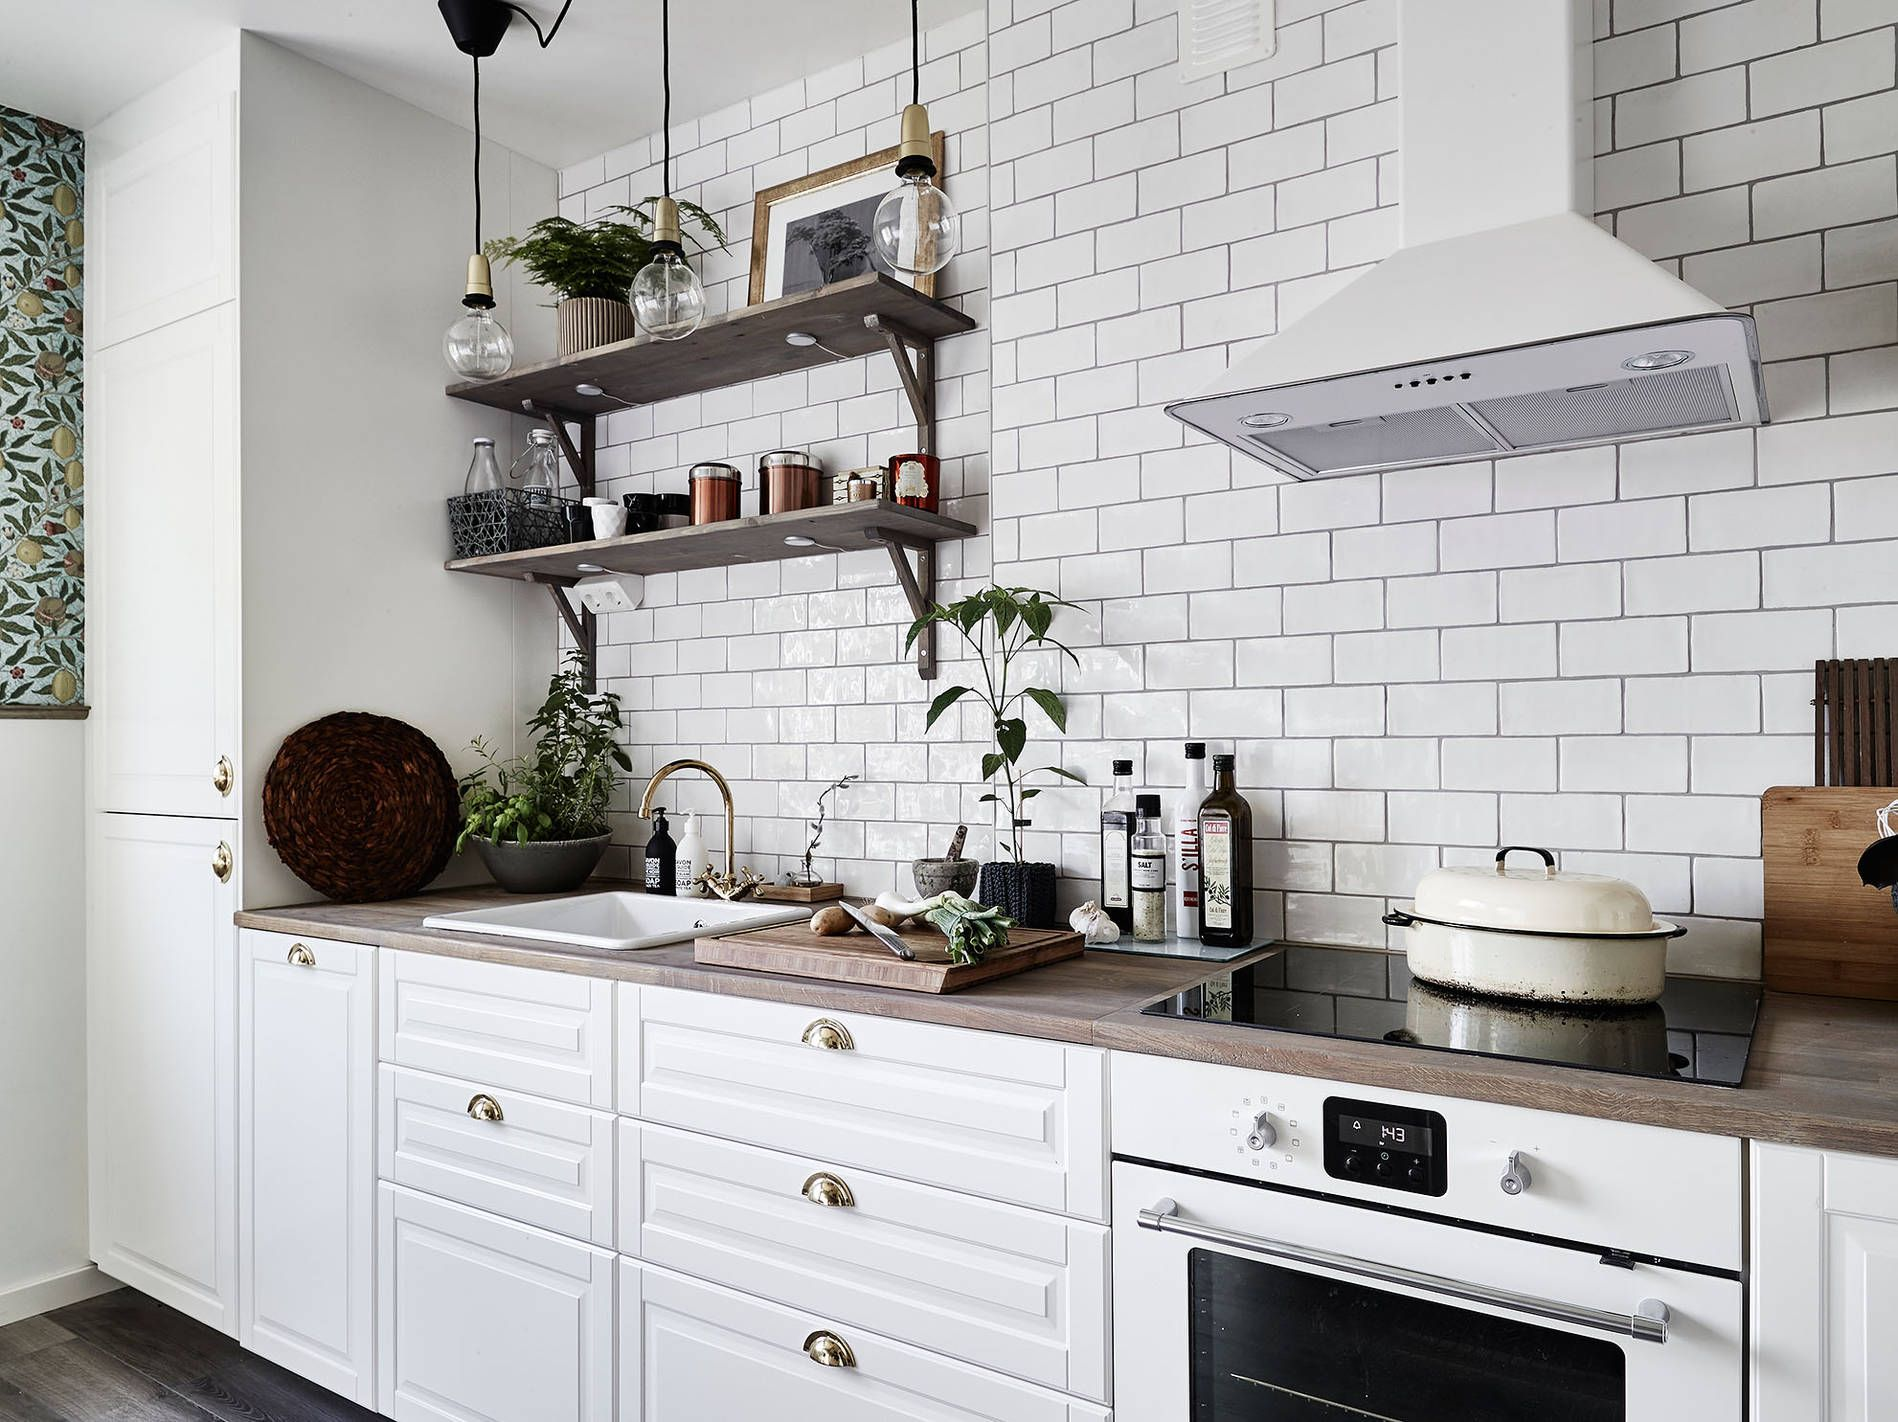 20 Beautiful Red Brick Kitchen Design Ideas Brick Wall Kitchen